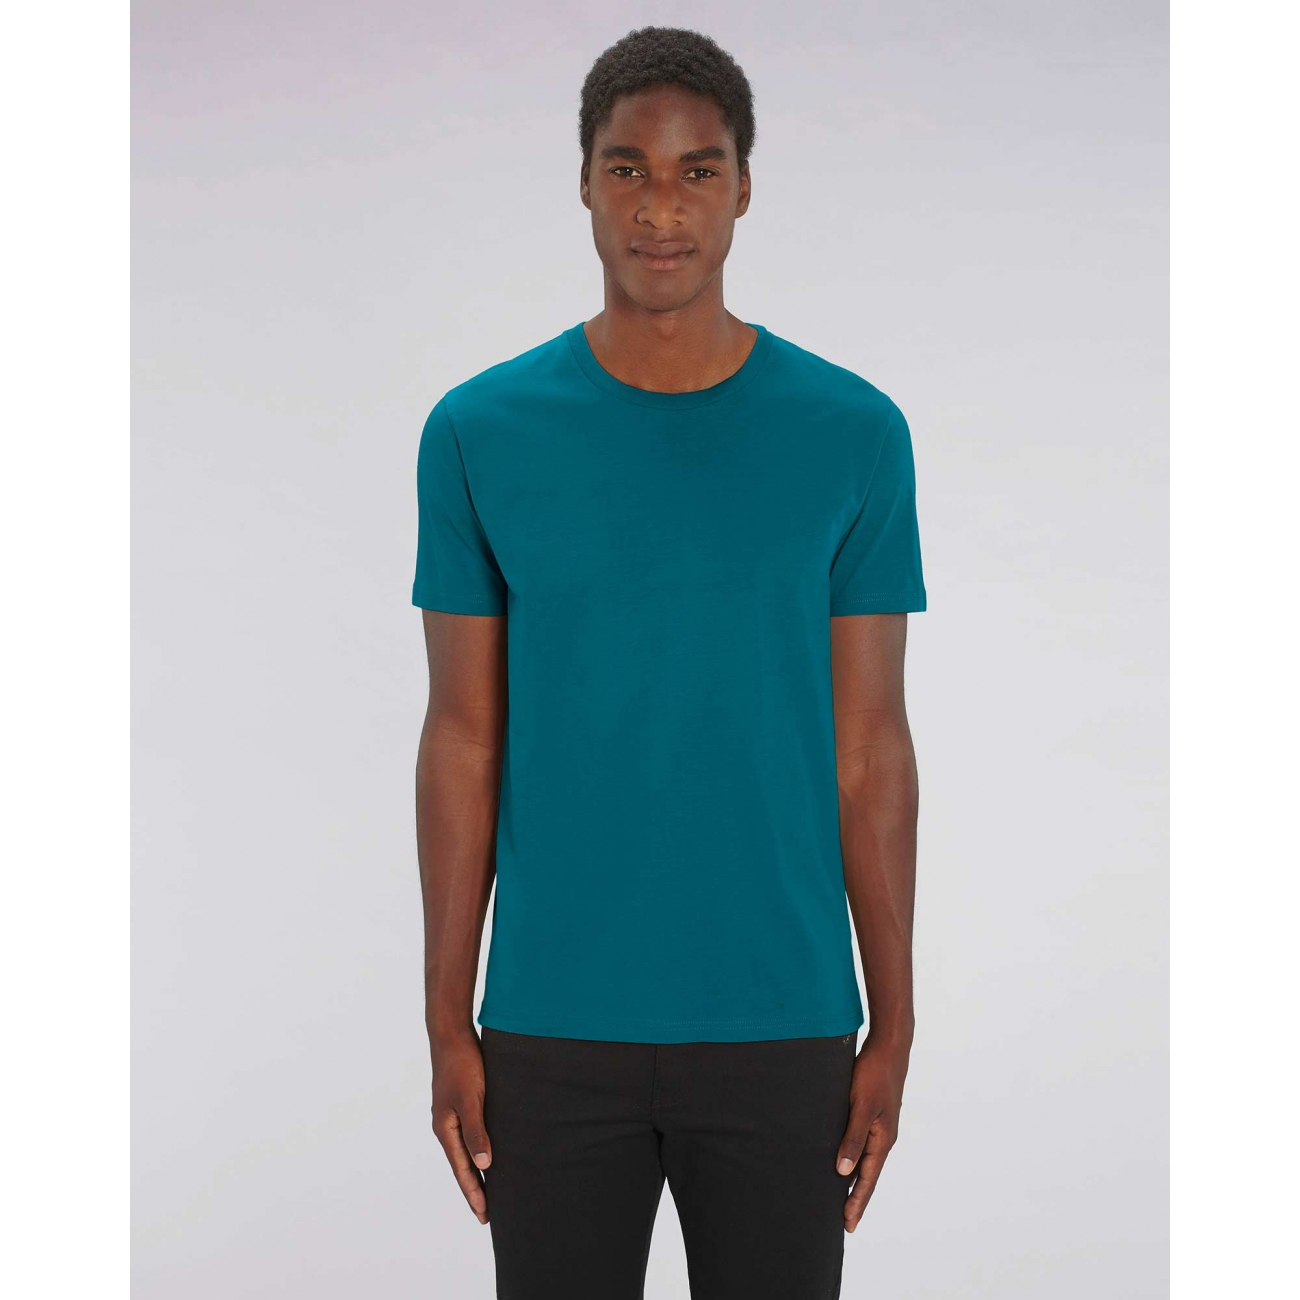 https://tee-shirt-bio.com/9419-thickbox_default/tee-shirt-coton-bio-col-rond-bleu-canard-clair.jpg